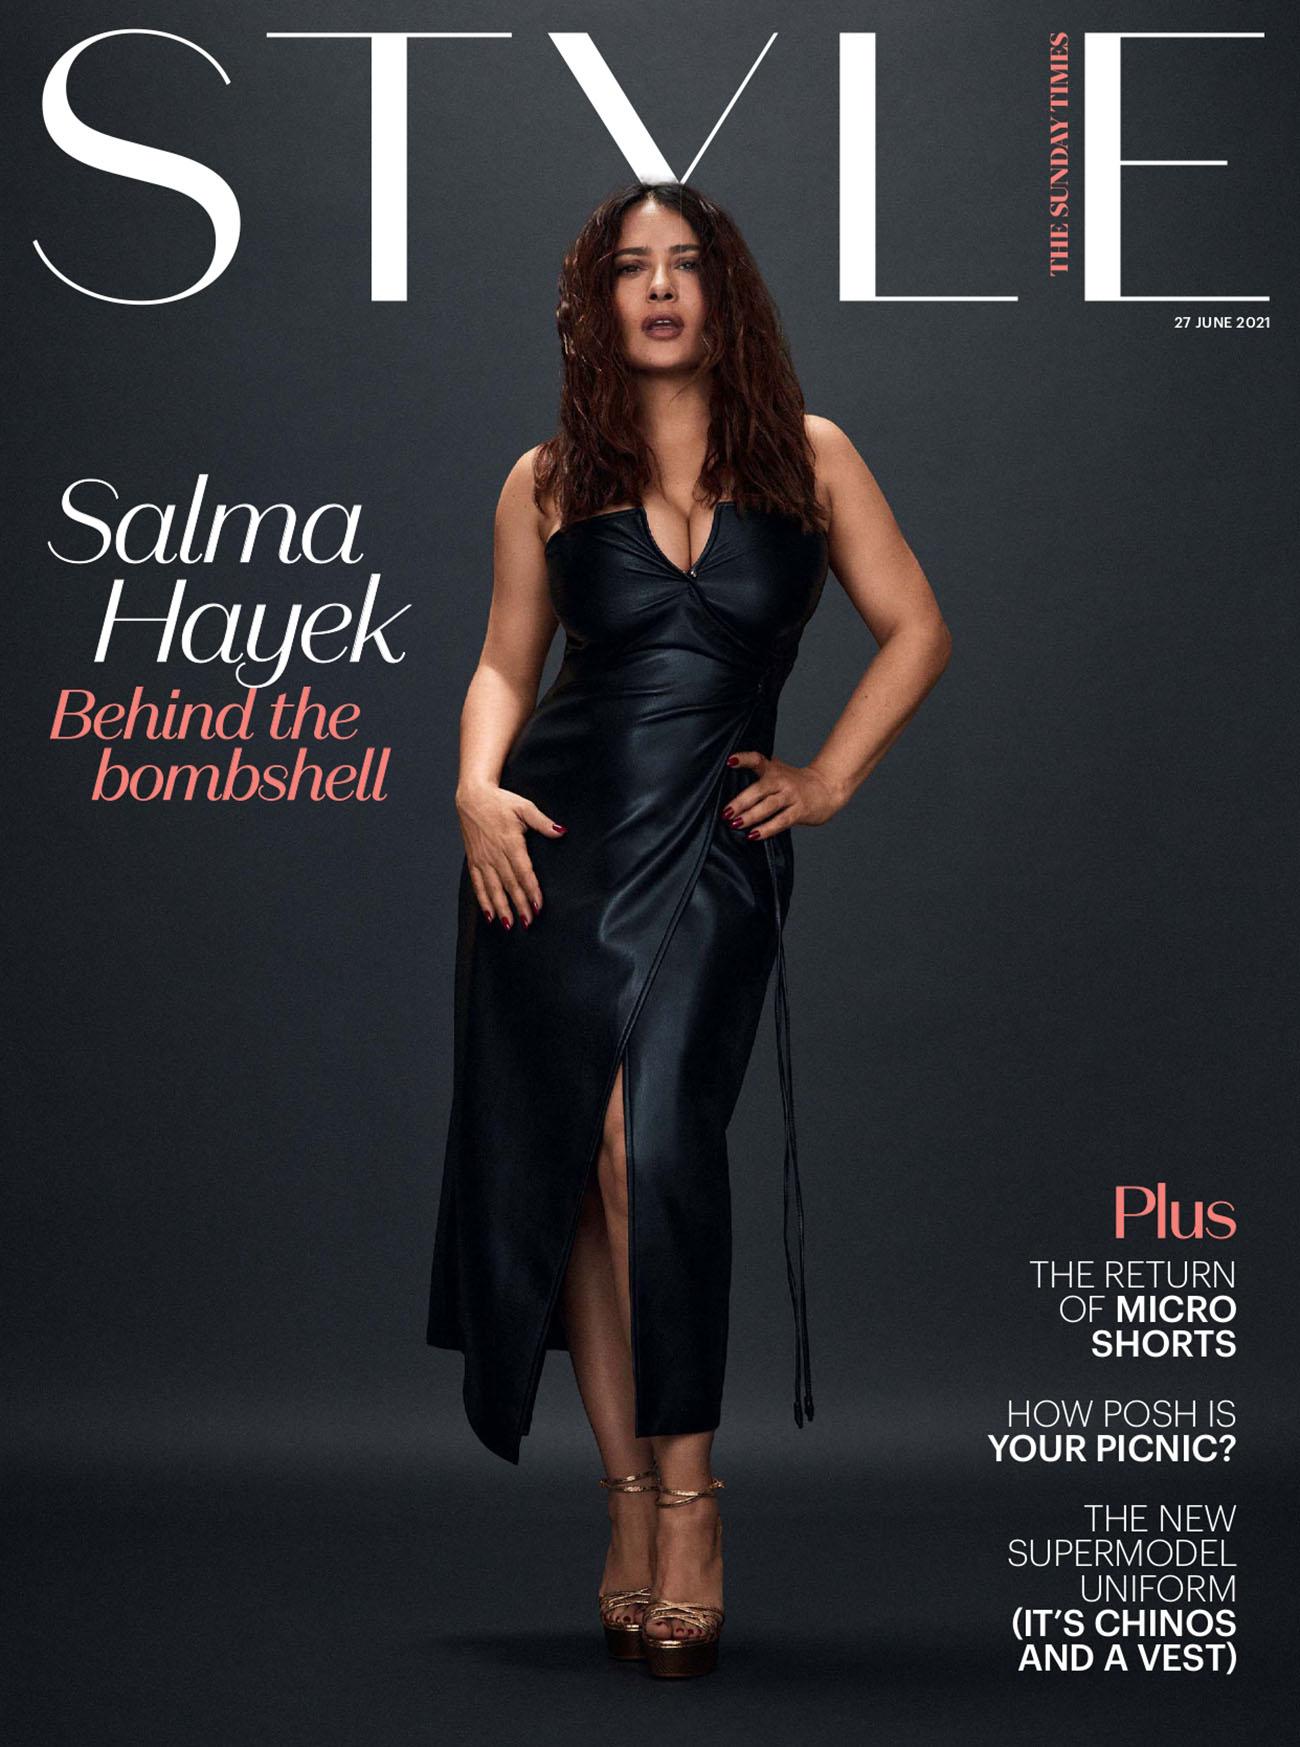 Salma Hayek covers The Sunday Times Style June 27th, 2021 by Matt Easton